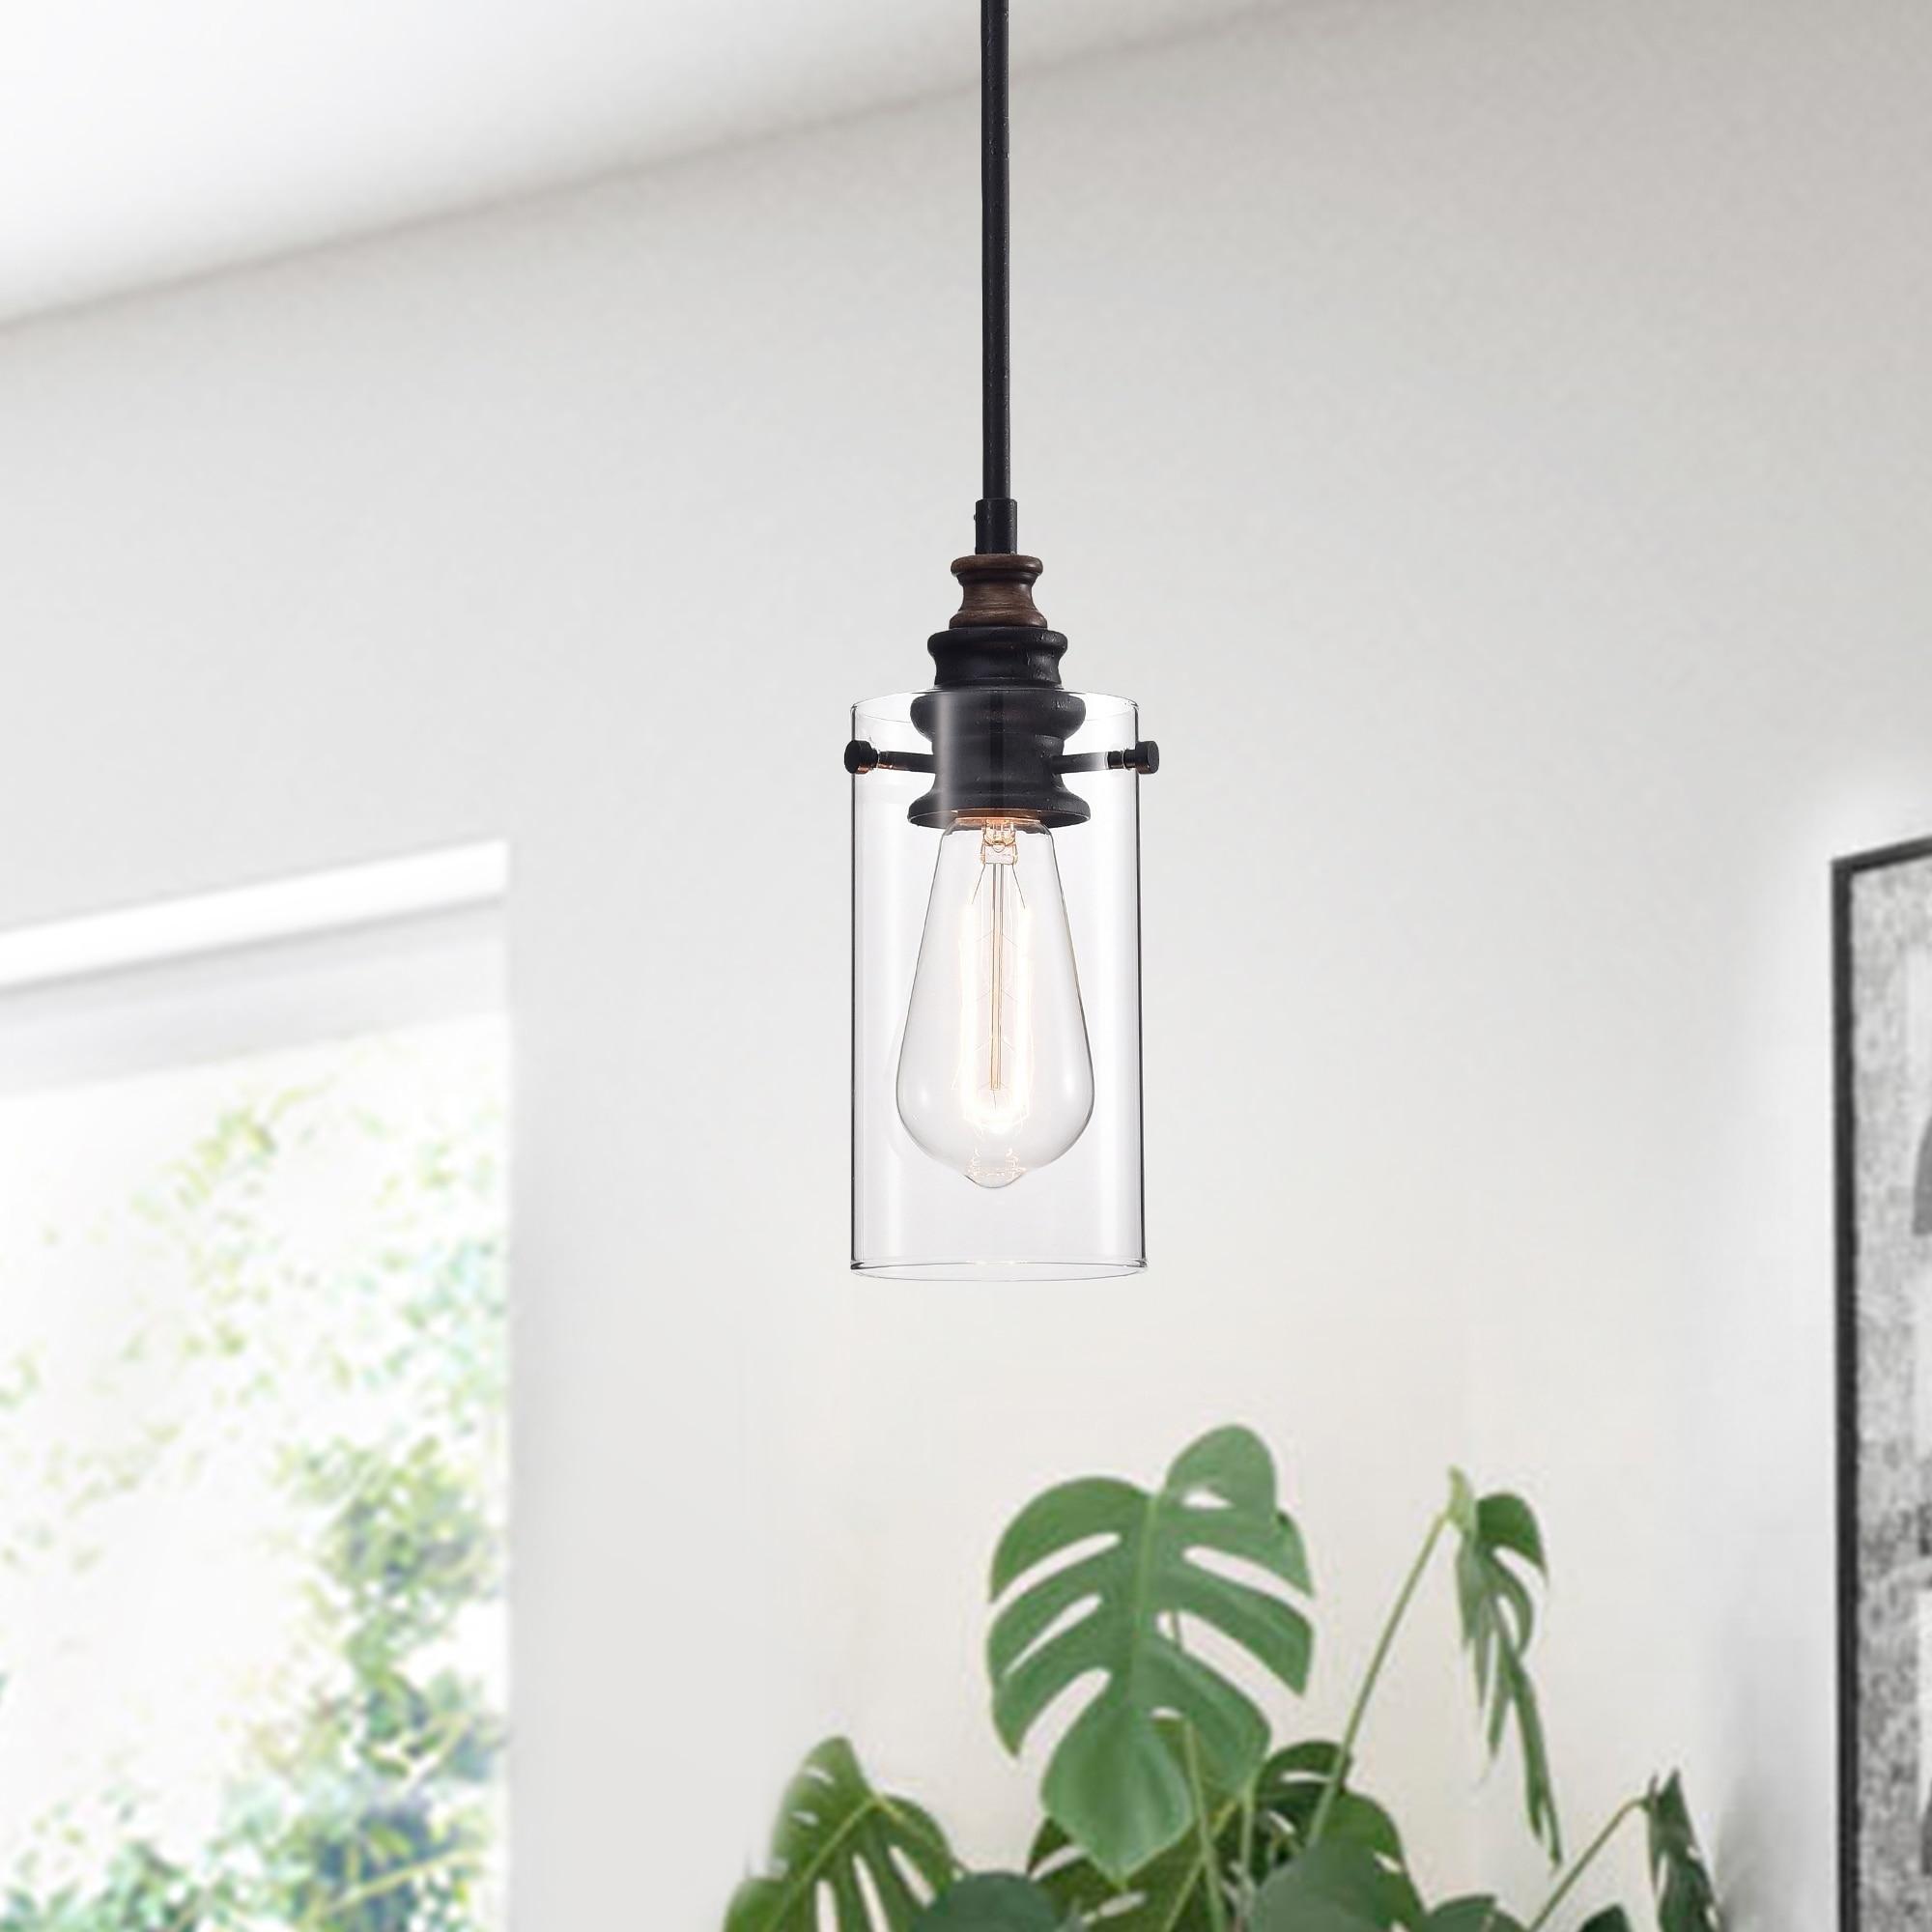 Shop Black Friday Deals On Tedosha 1 Light Black Pendant Lamp With Glass Cylinder Shade Includes Edison Bulb Overstock 23068197